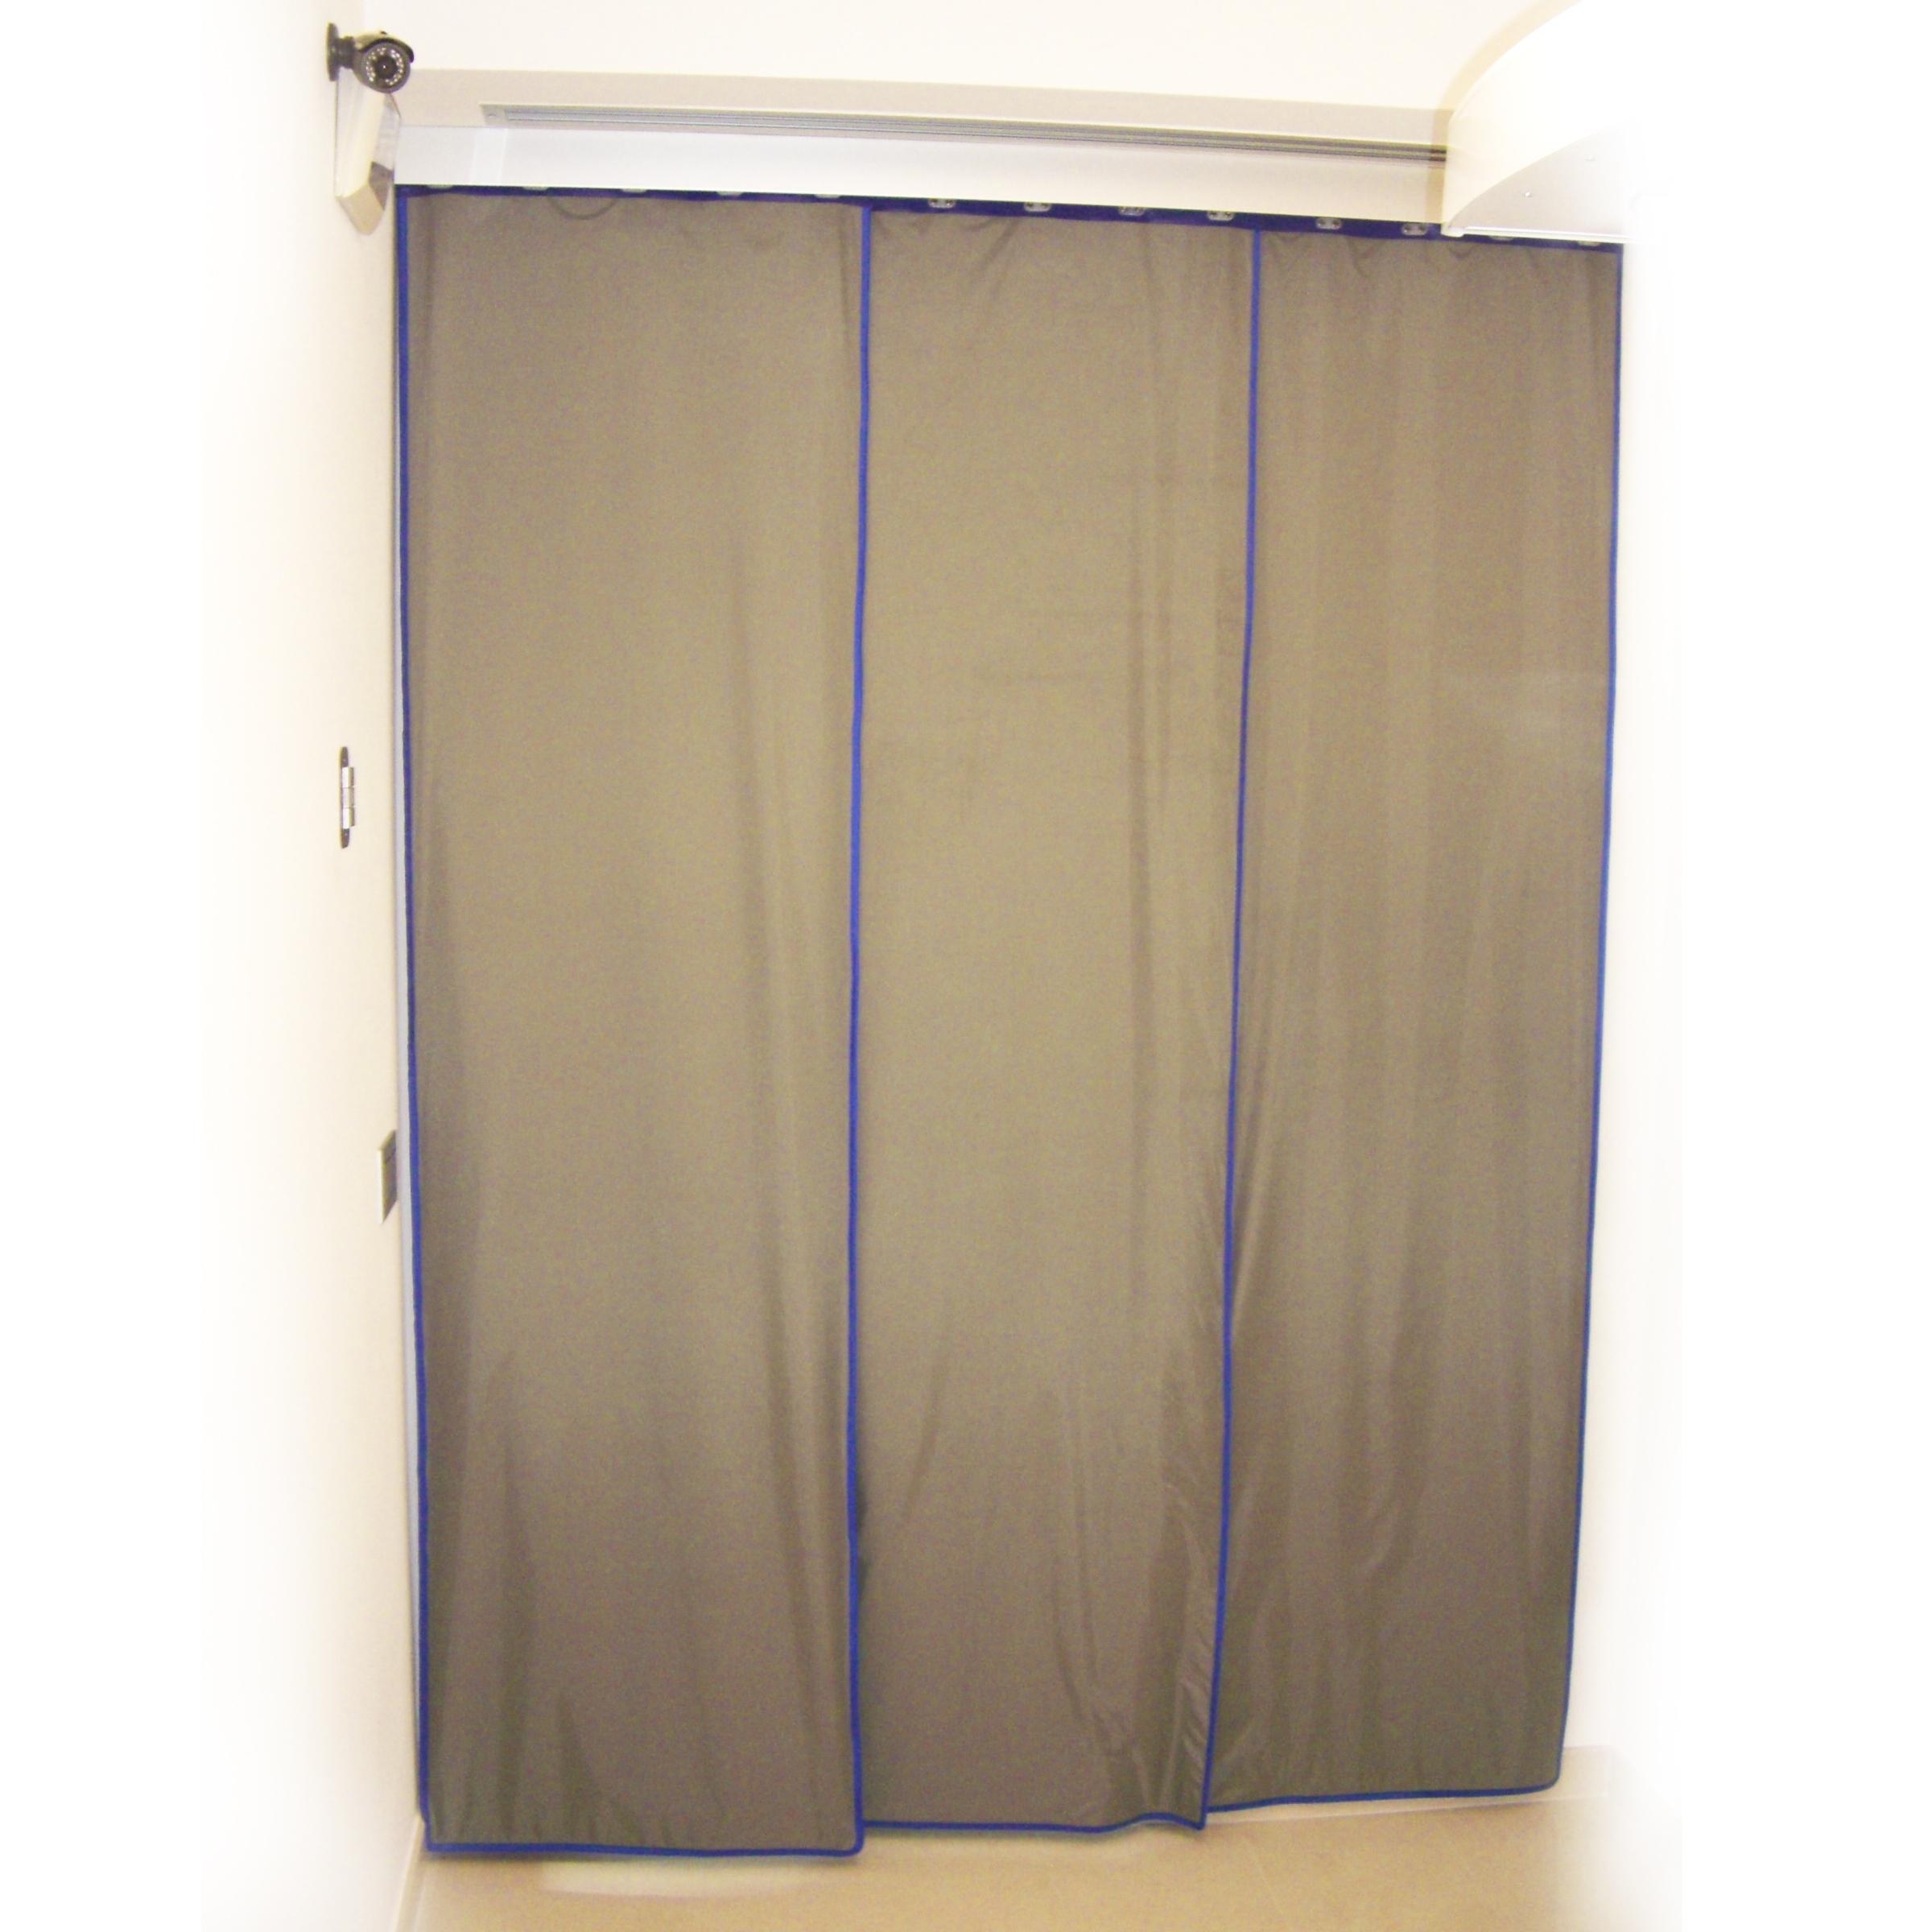 Lead Curtains Cablas